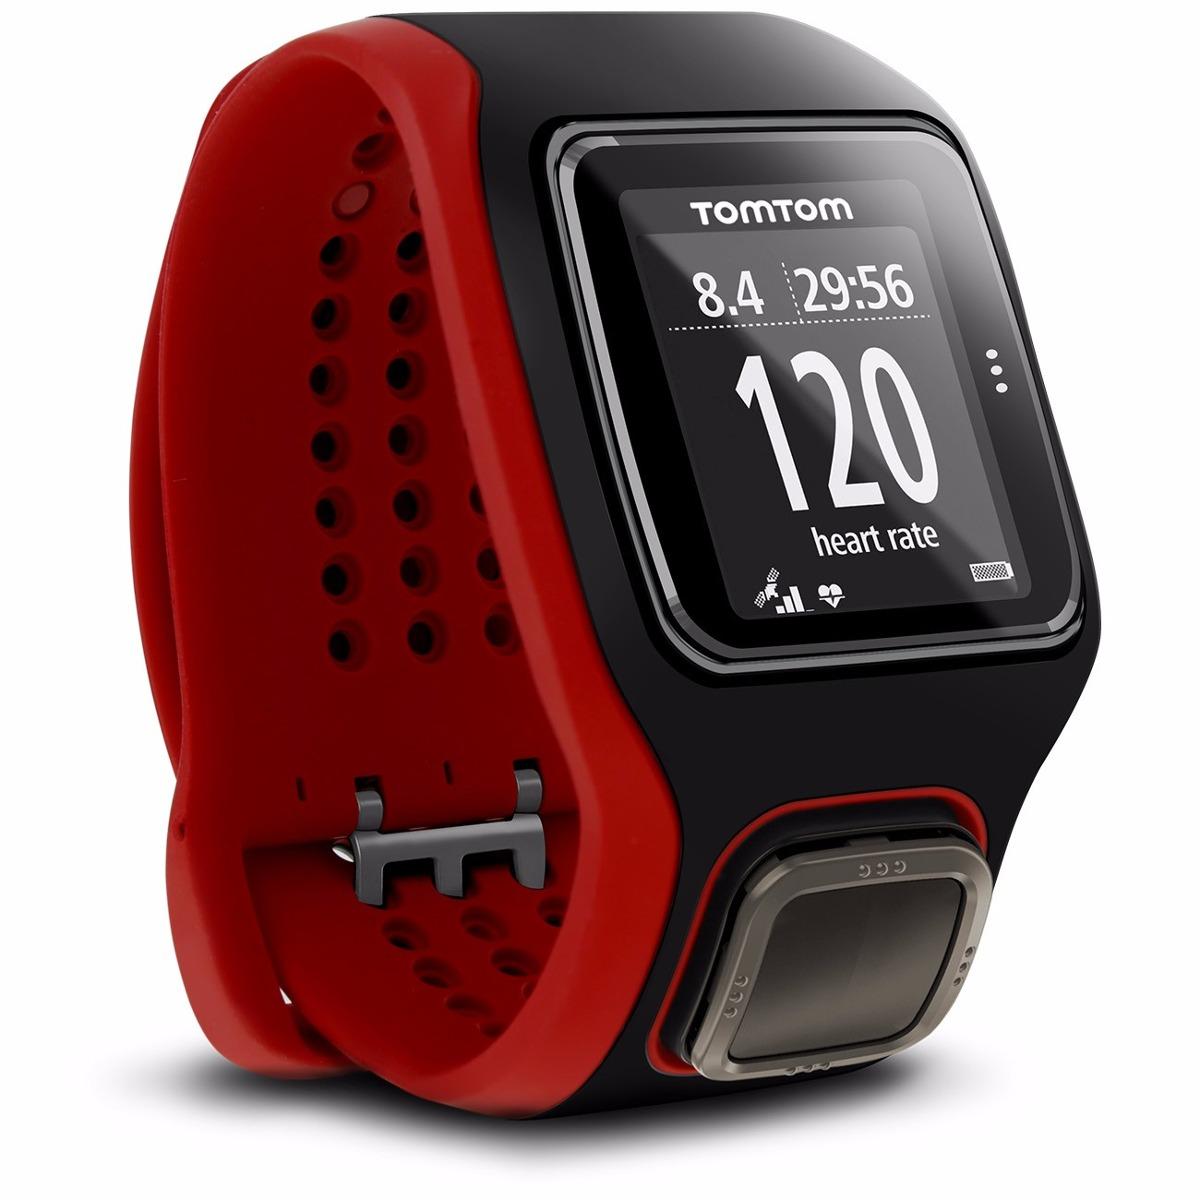 472d04dfcc5 Relógio De Corrida Multi-sport Cardio Tomtom Gps Monitor Car - R ...